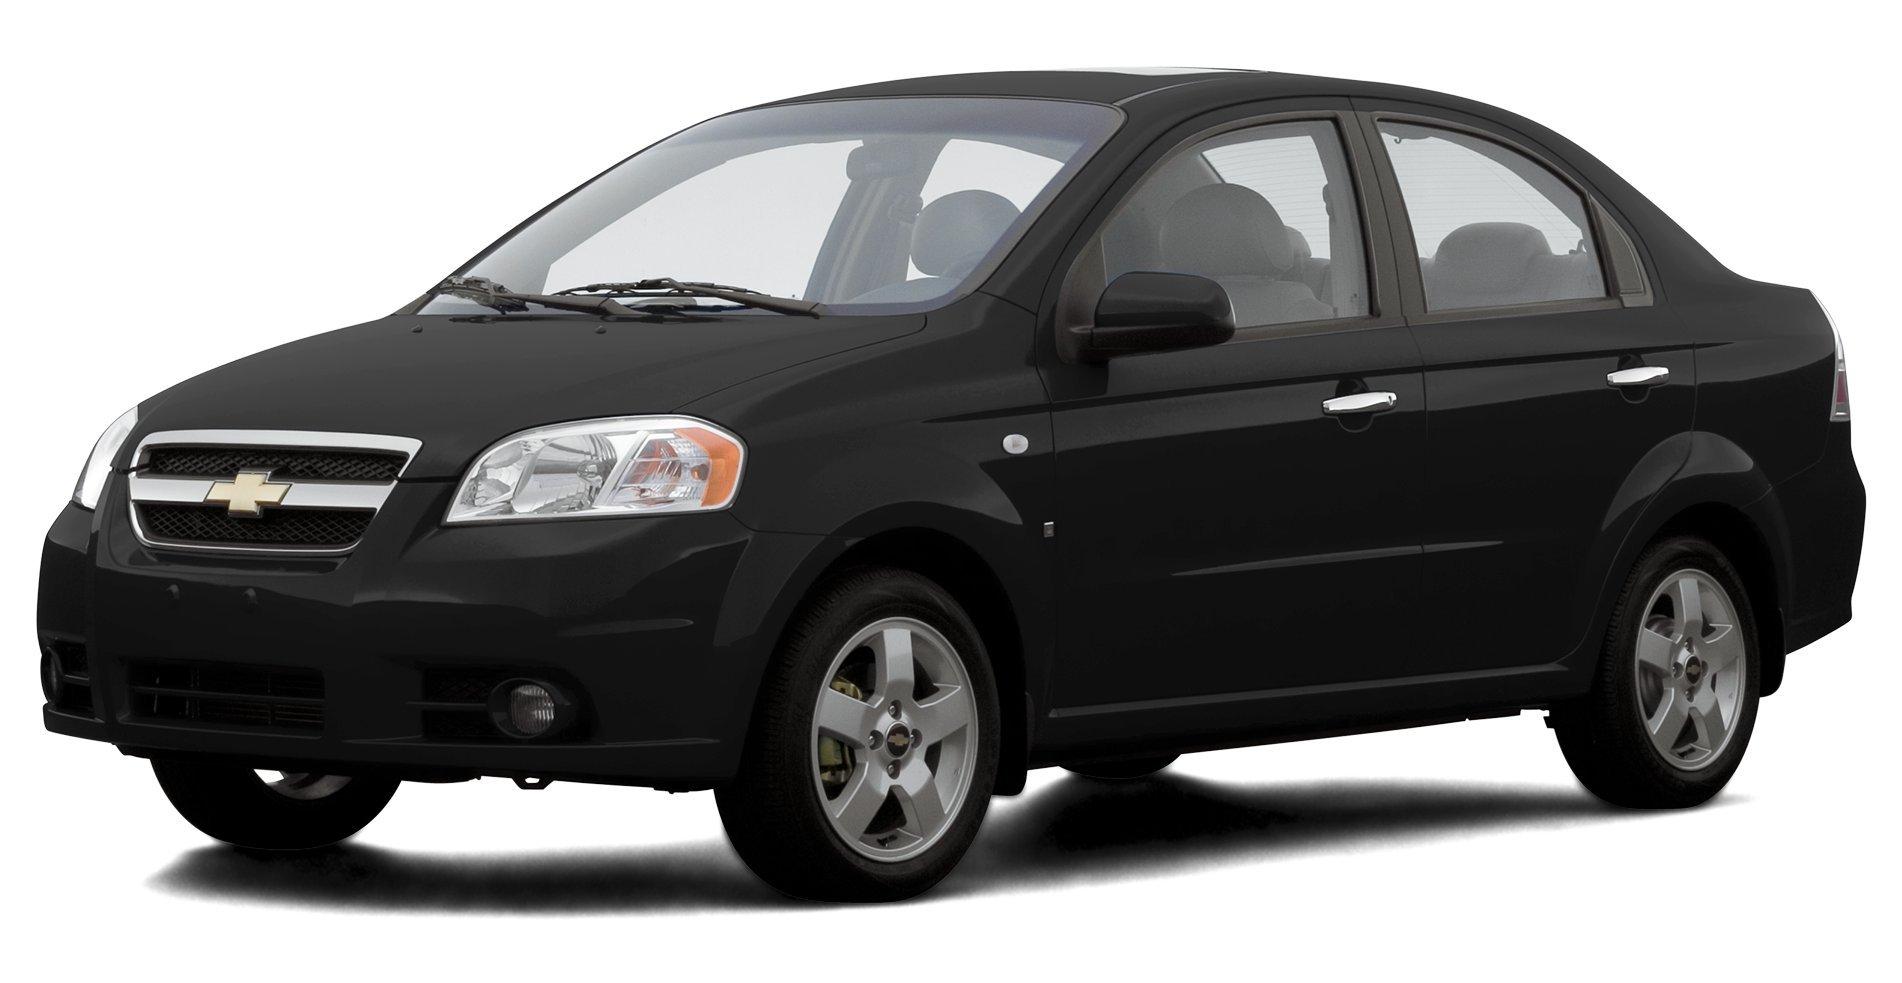 Kelebihan Kekurangan Chevrolet Aveo 2007 Murah Berkualitas